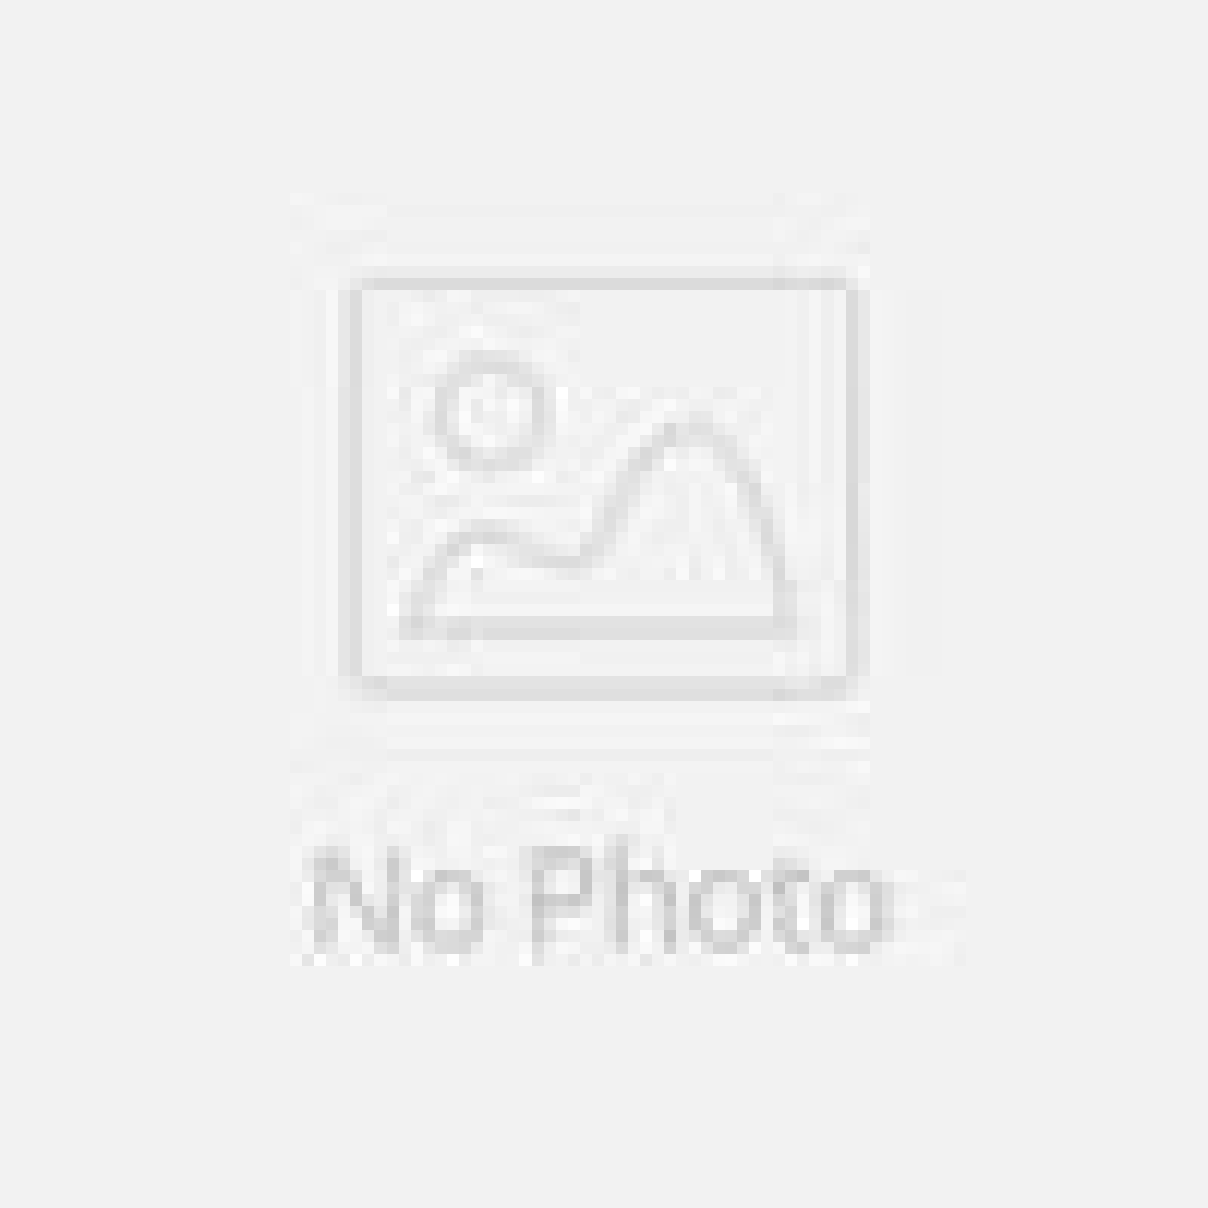 Женское платье 2015 Vestidos Vestido V Aierwill женское платье booming jelly v 2015 vestido vestidos 141029 page 3